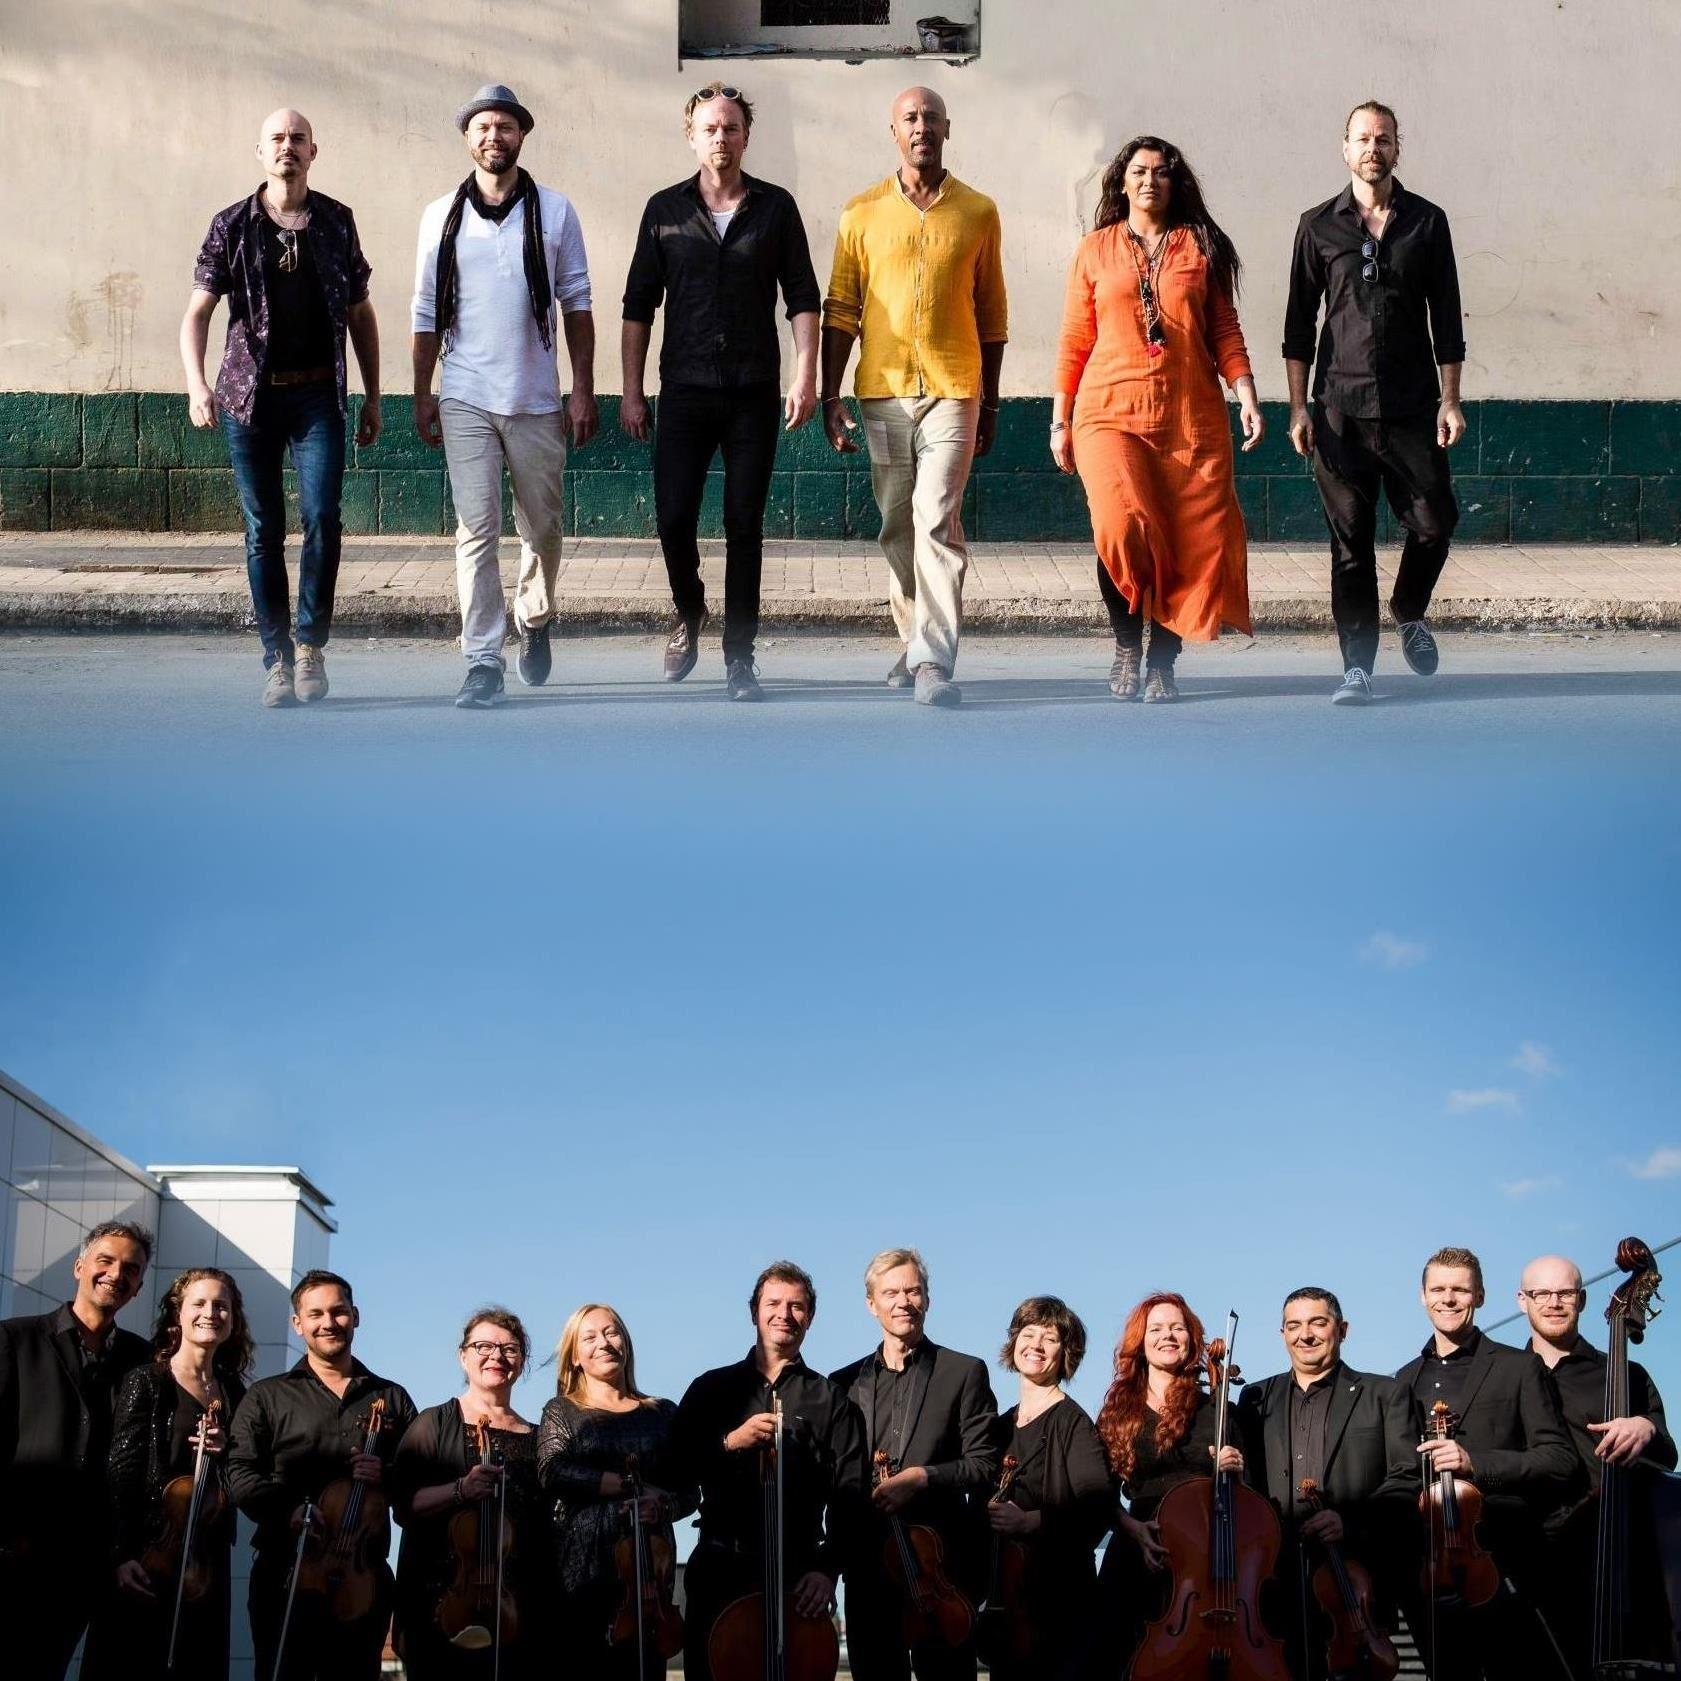 Sabry Kahled, Alexander Mahoud, Musik: Tarabband möter Musica Vitae - i en större värld